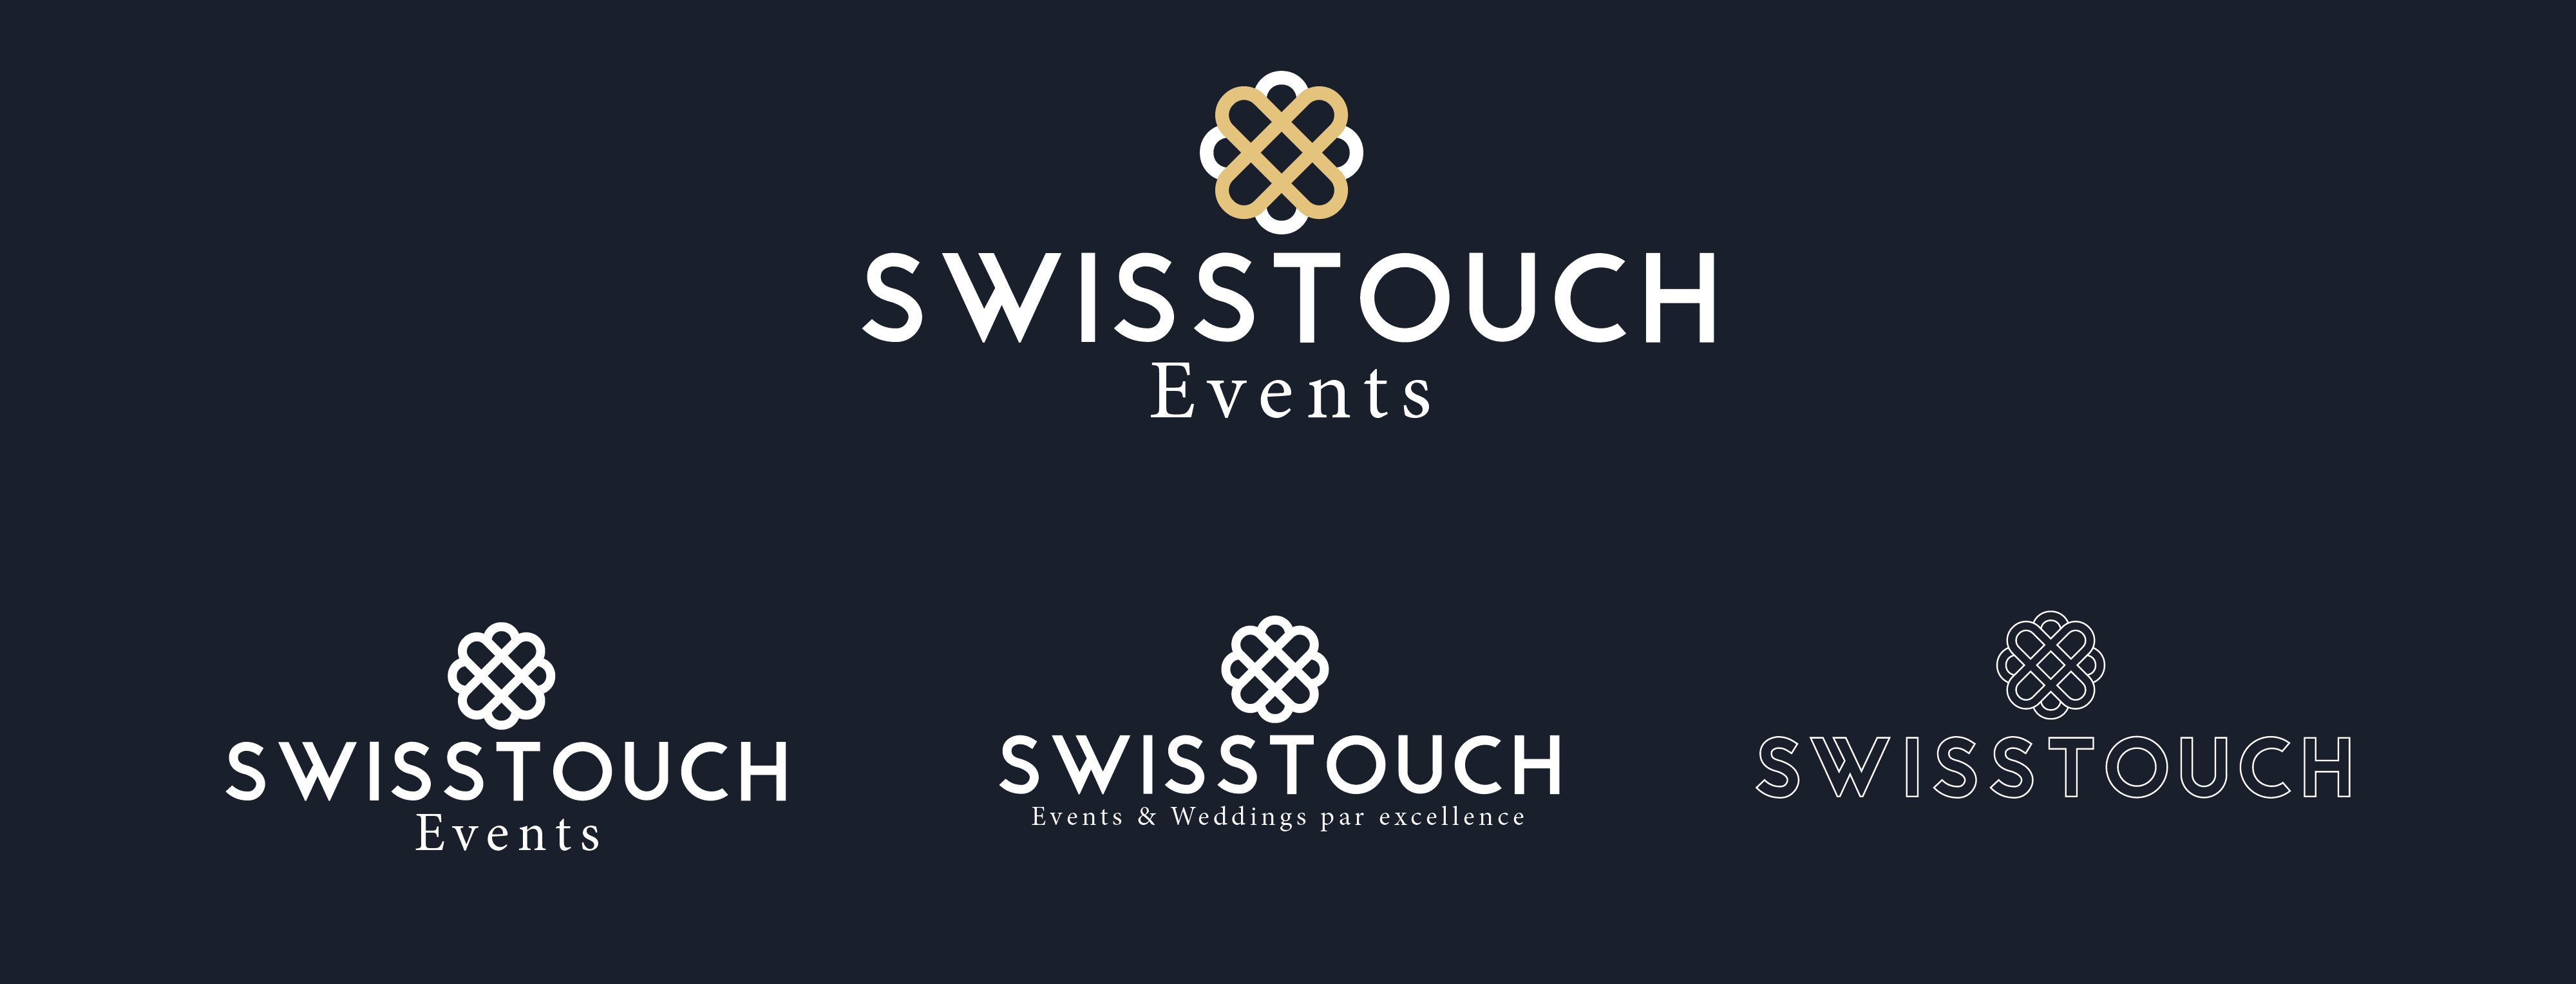 logos-swisstouch